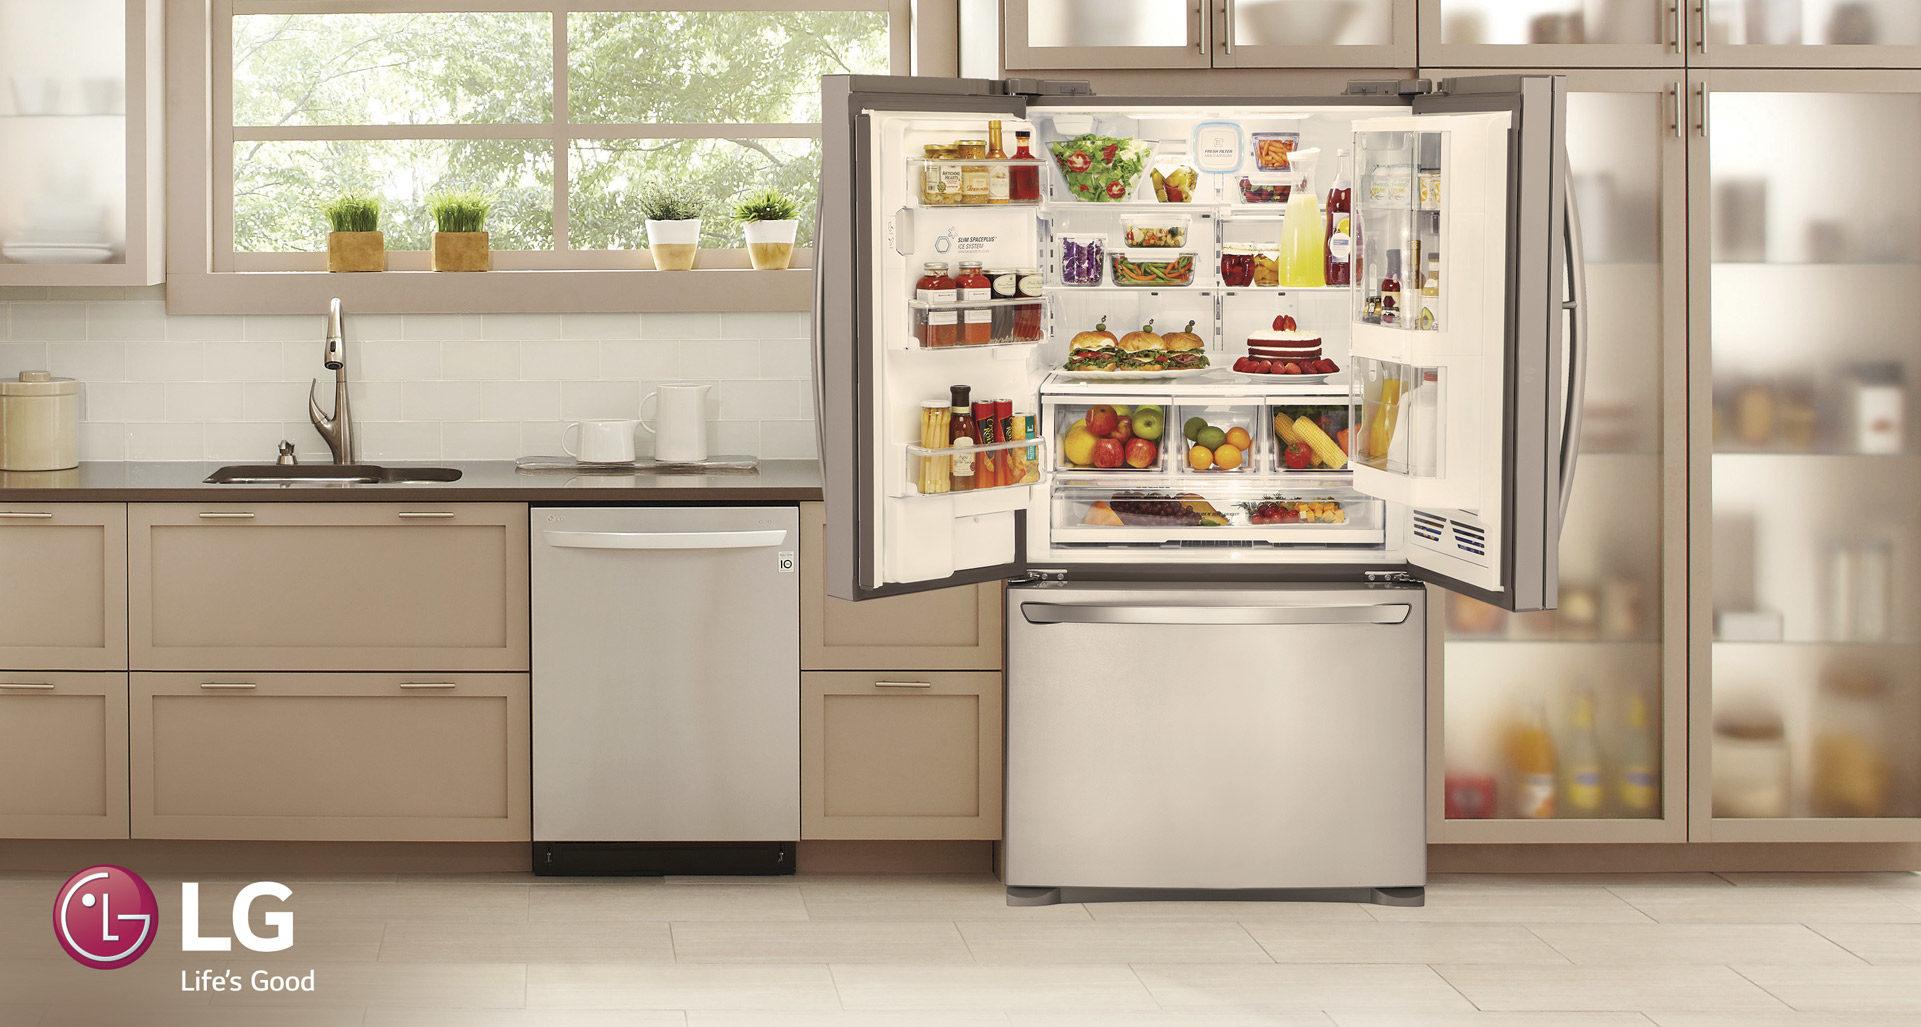 Refrigeradoras modernas revolucionan sus dise os para for Precio de puertas francesas